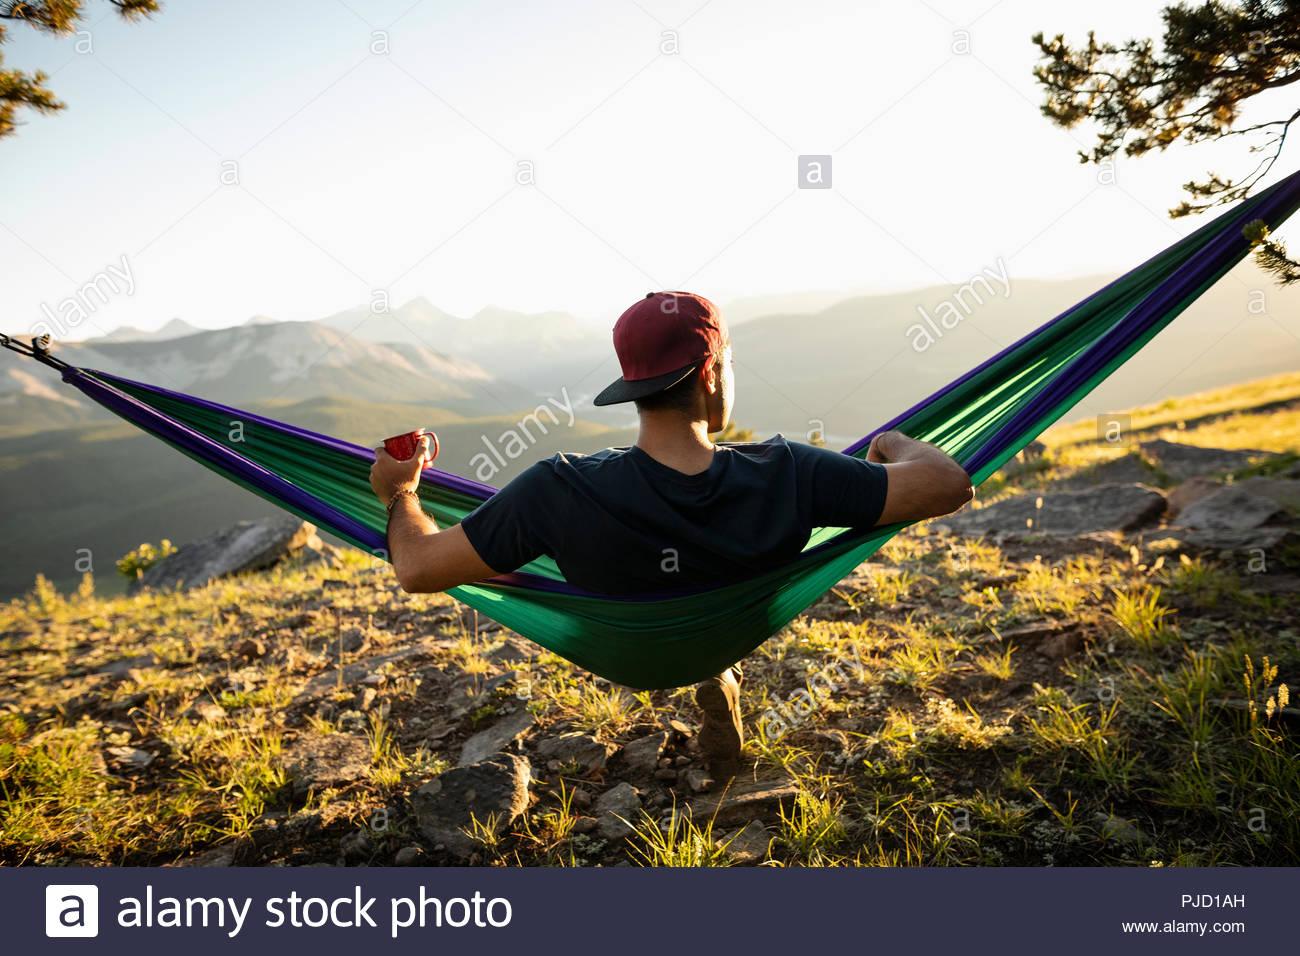 Serene Man Drinking Coffee In Sunny Hammock With Idyllic Mountain